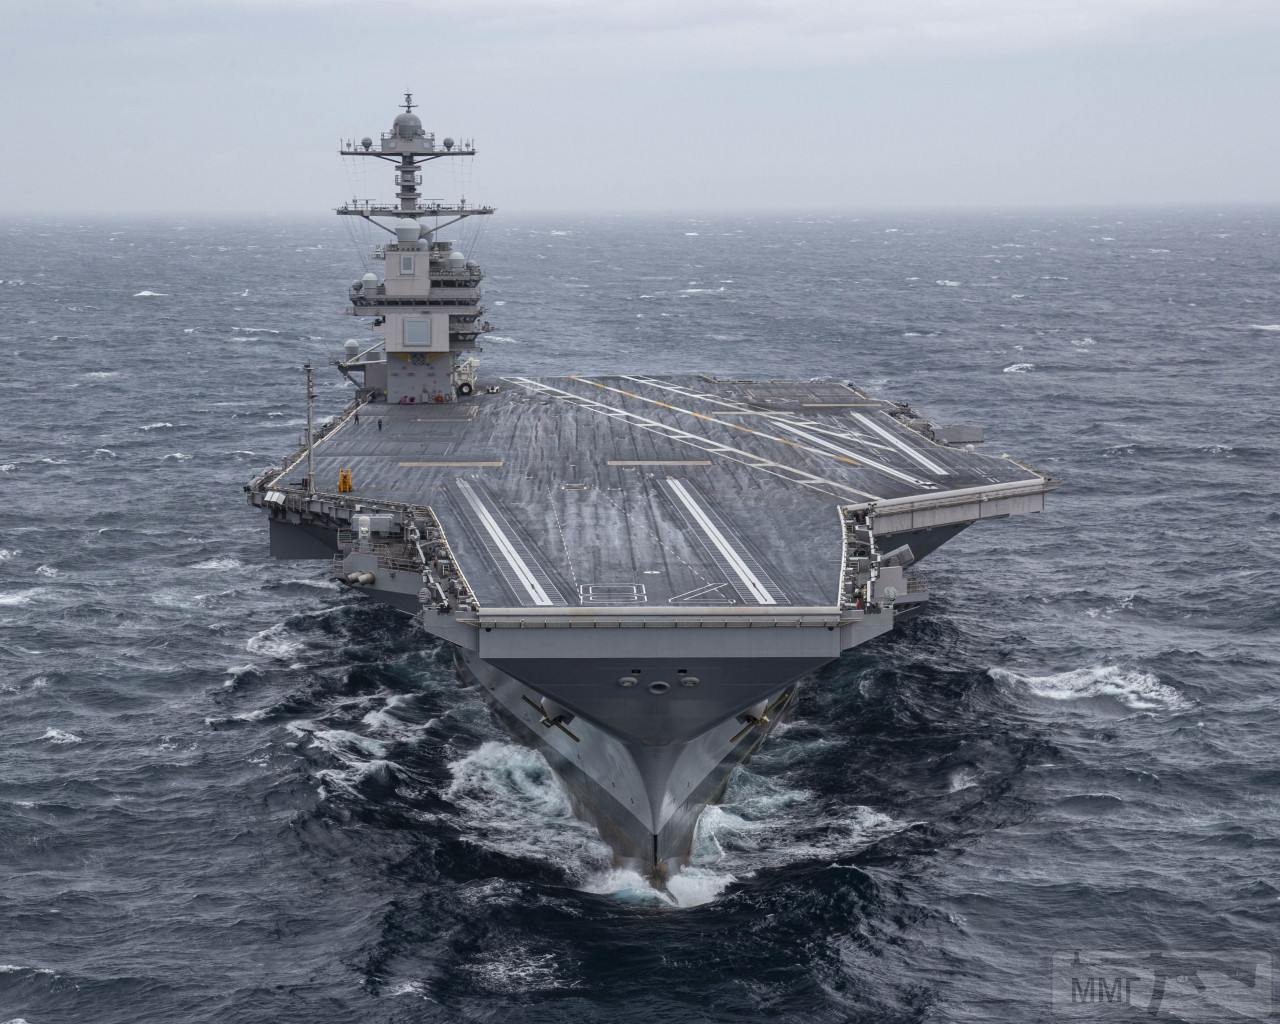 79073 - USS Gerald R. Ford (CVN-78)